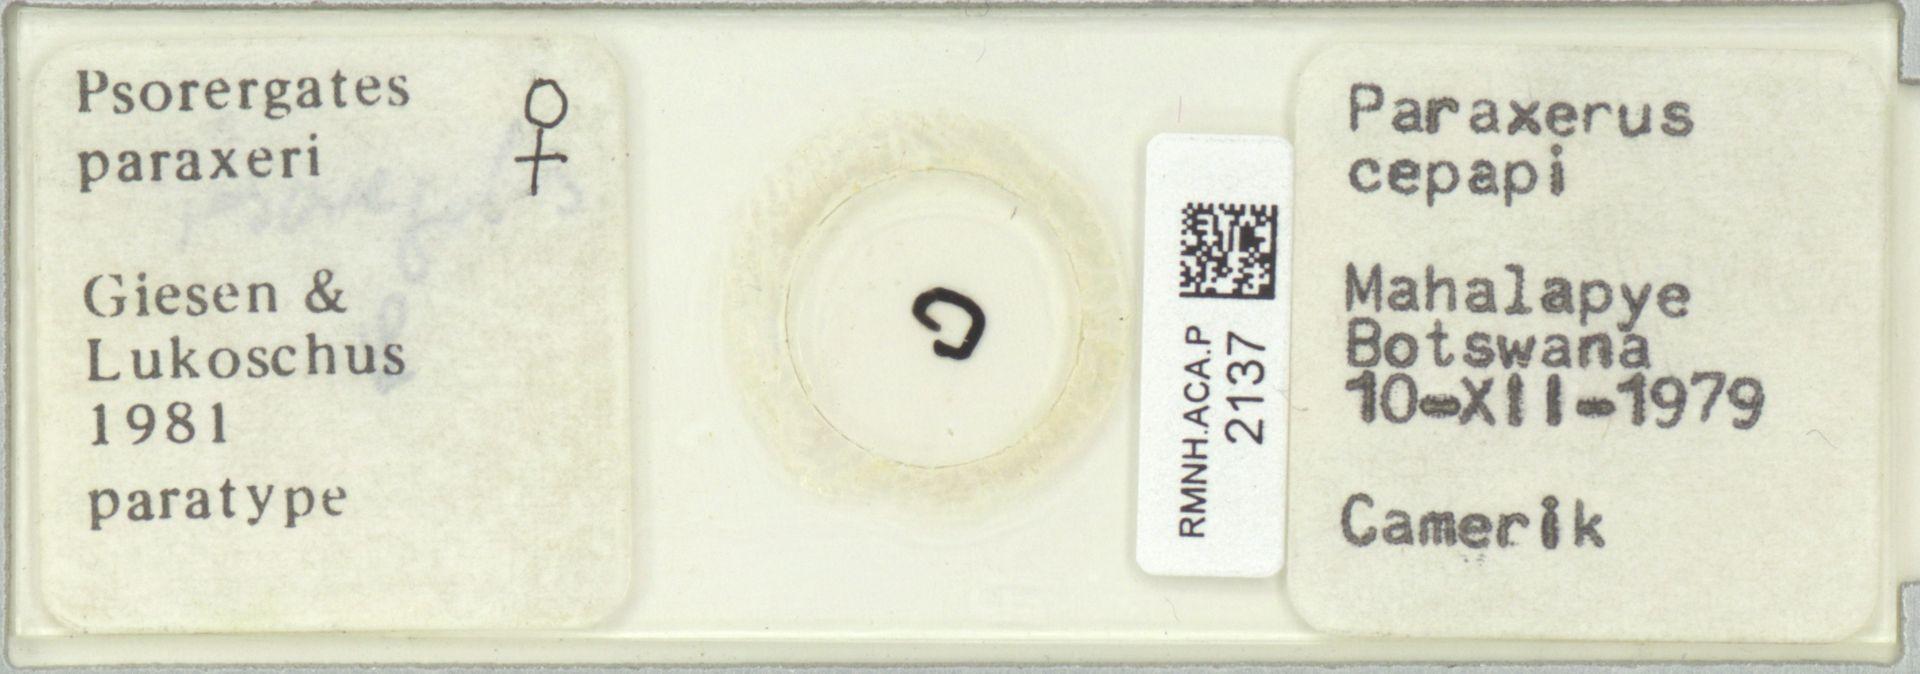 RMNH.ACA.P.2137 | Psorergates paraxeri Giessen & Lukoschus, 1981